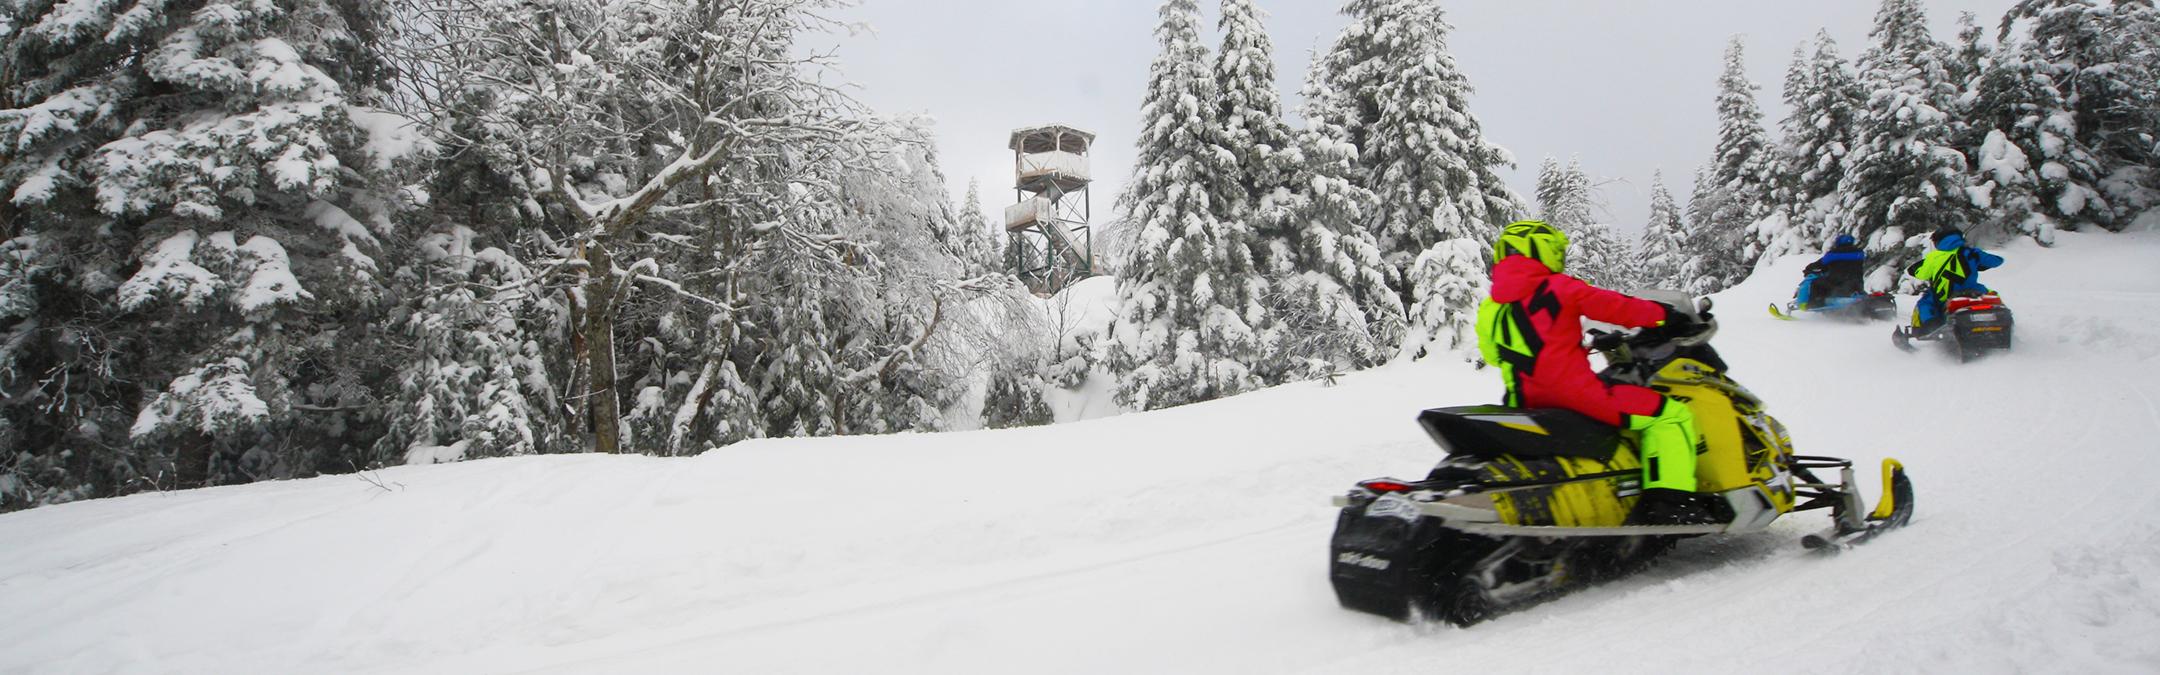 st-donat-snowmobile-club